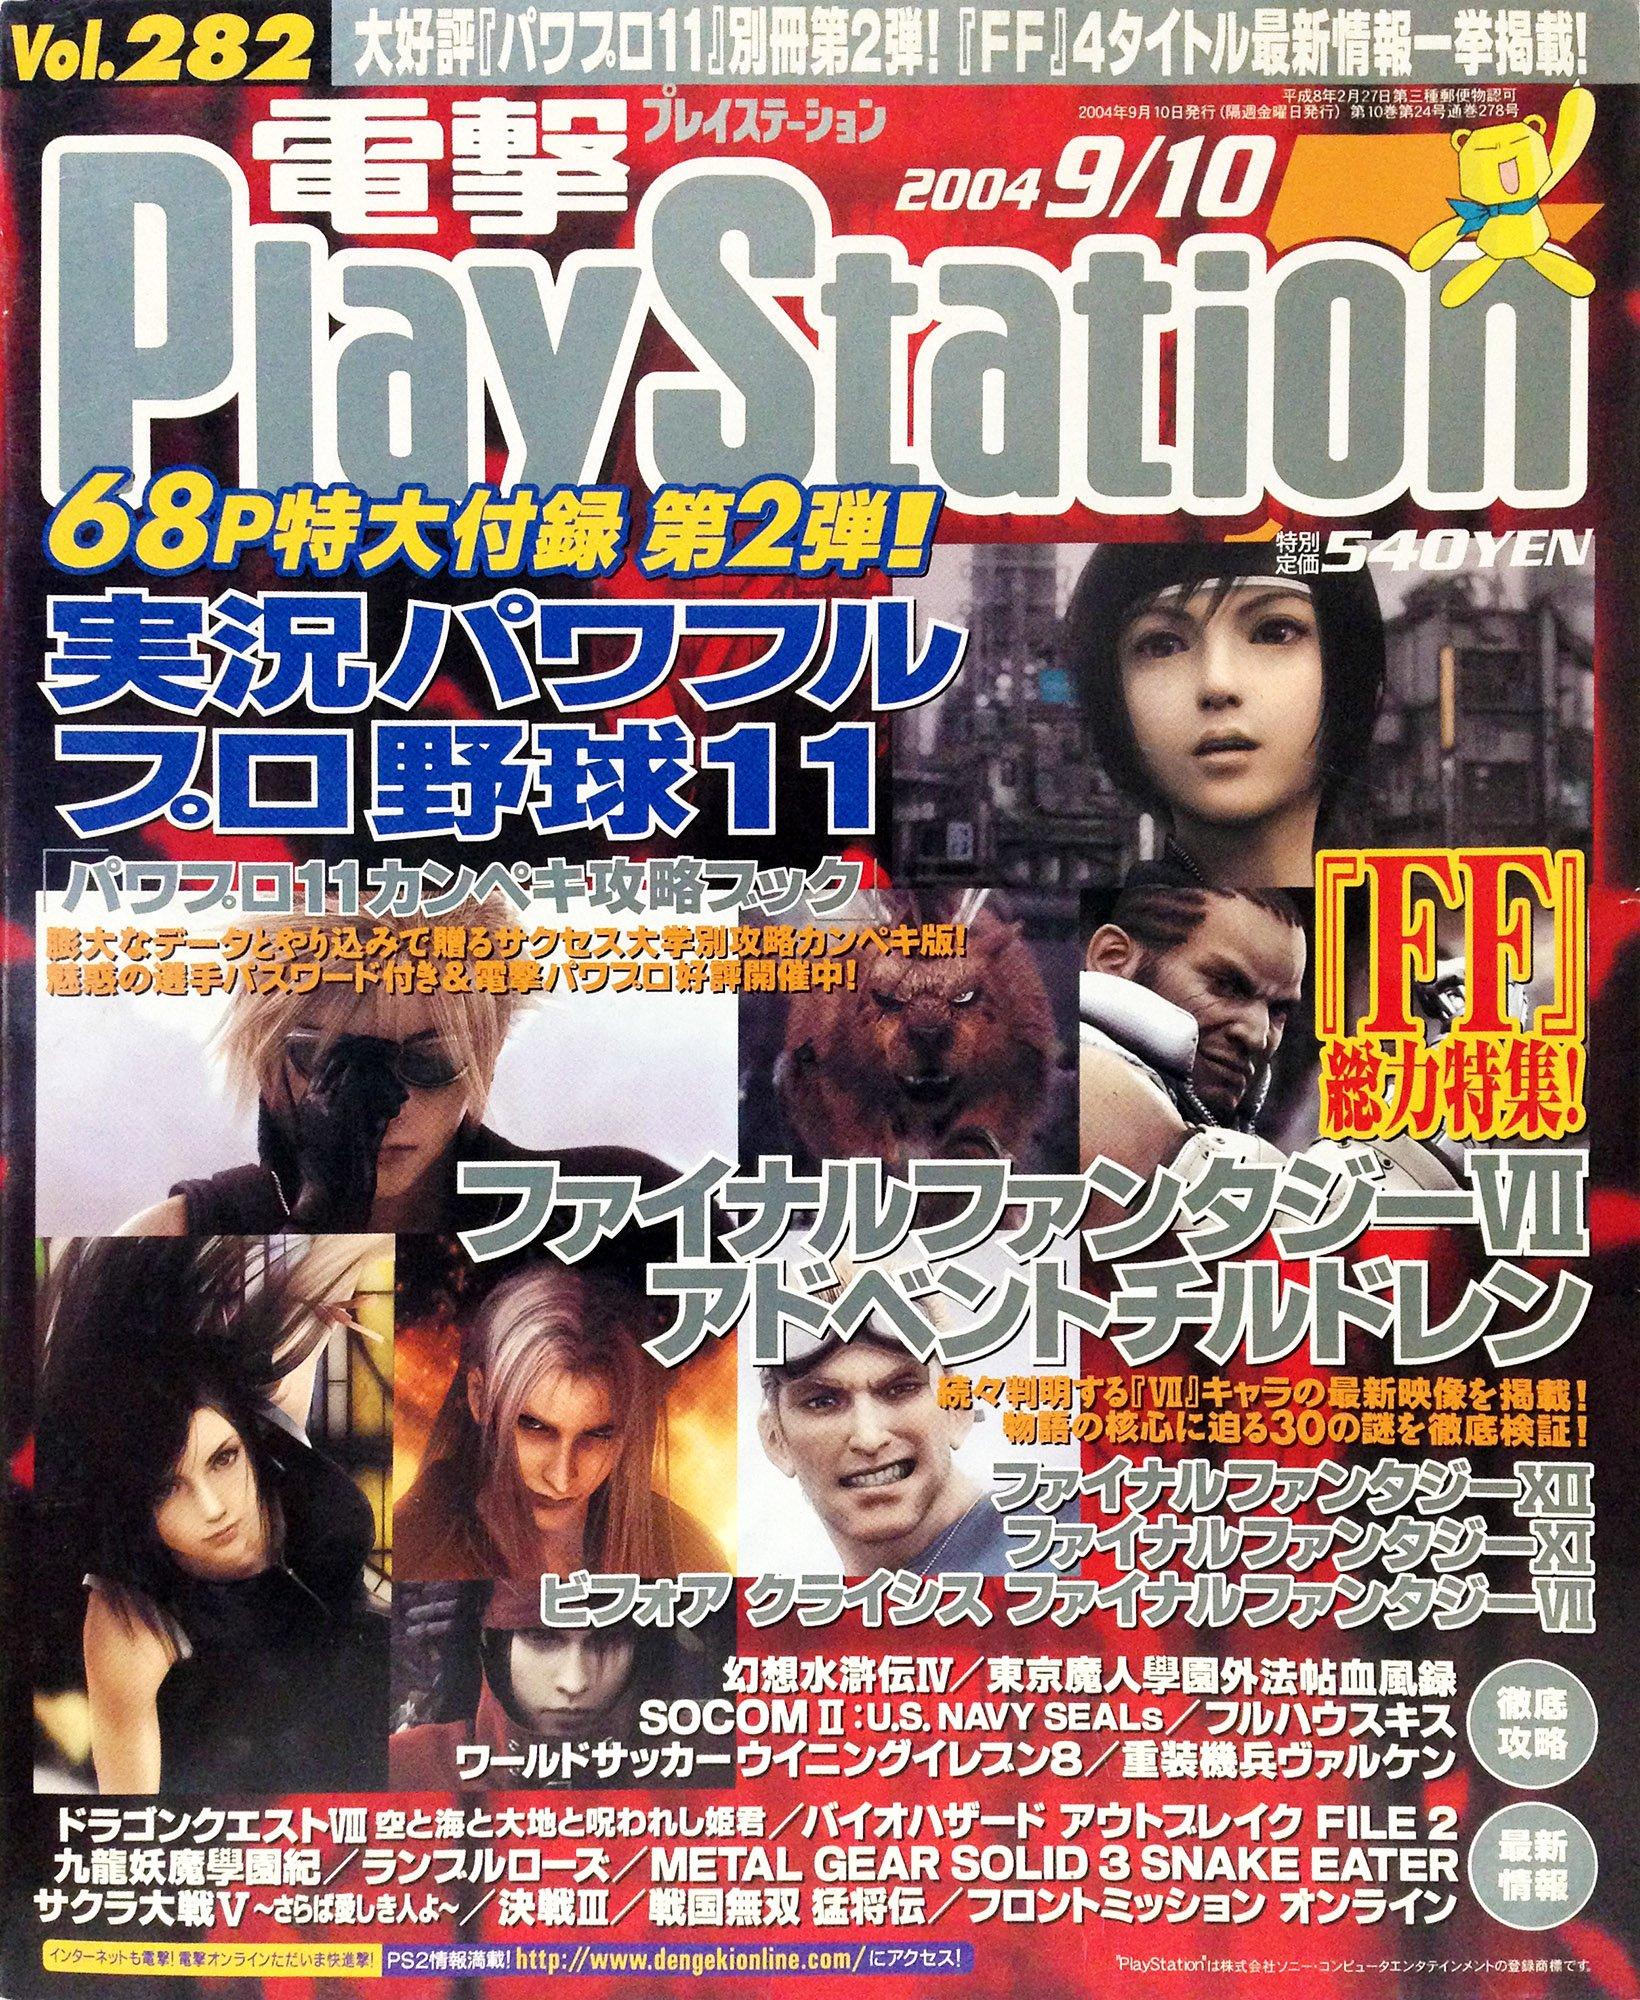 Dengeki PlayStation 282 (September 10, 2004)